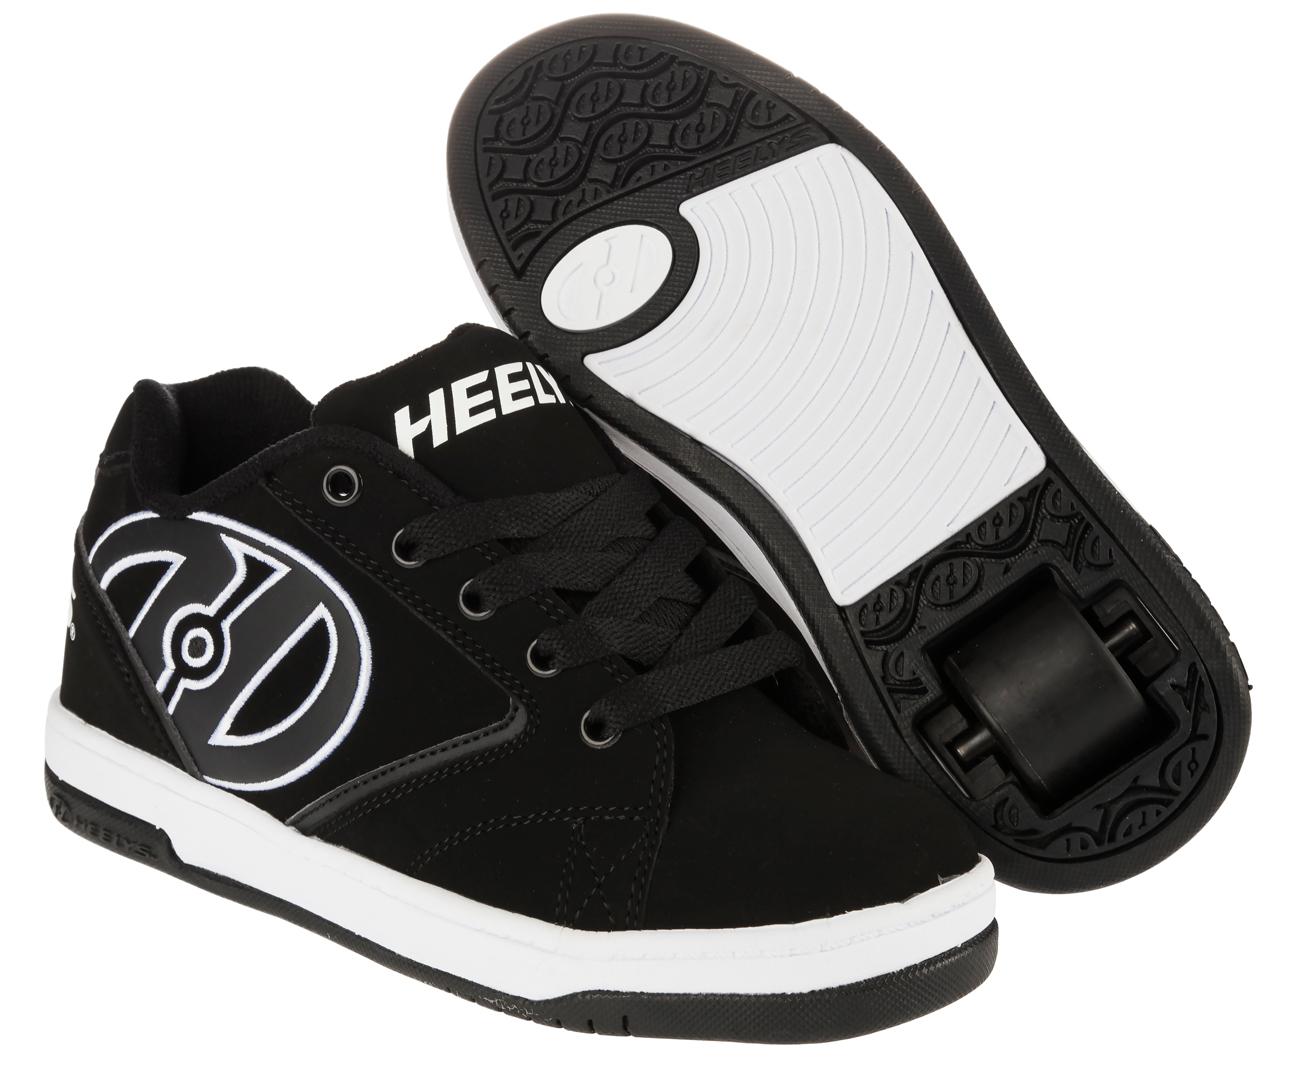 Heelys Roller Skate Shoes